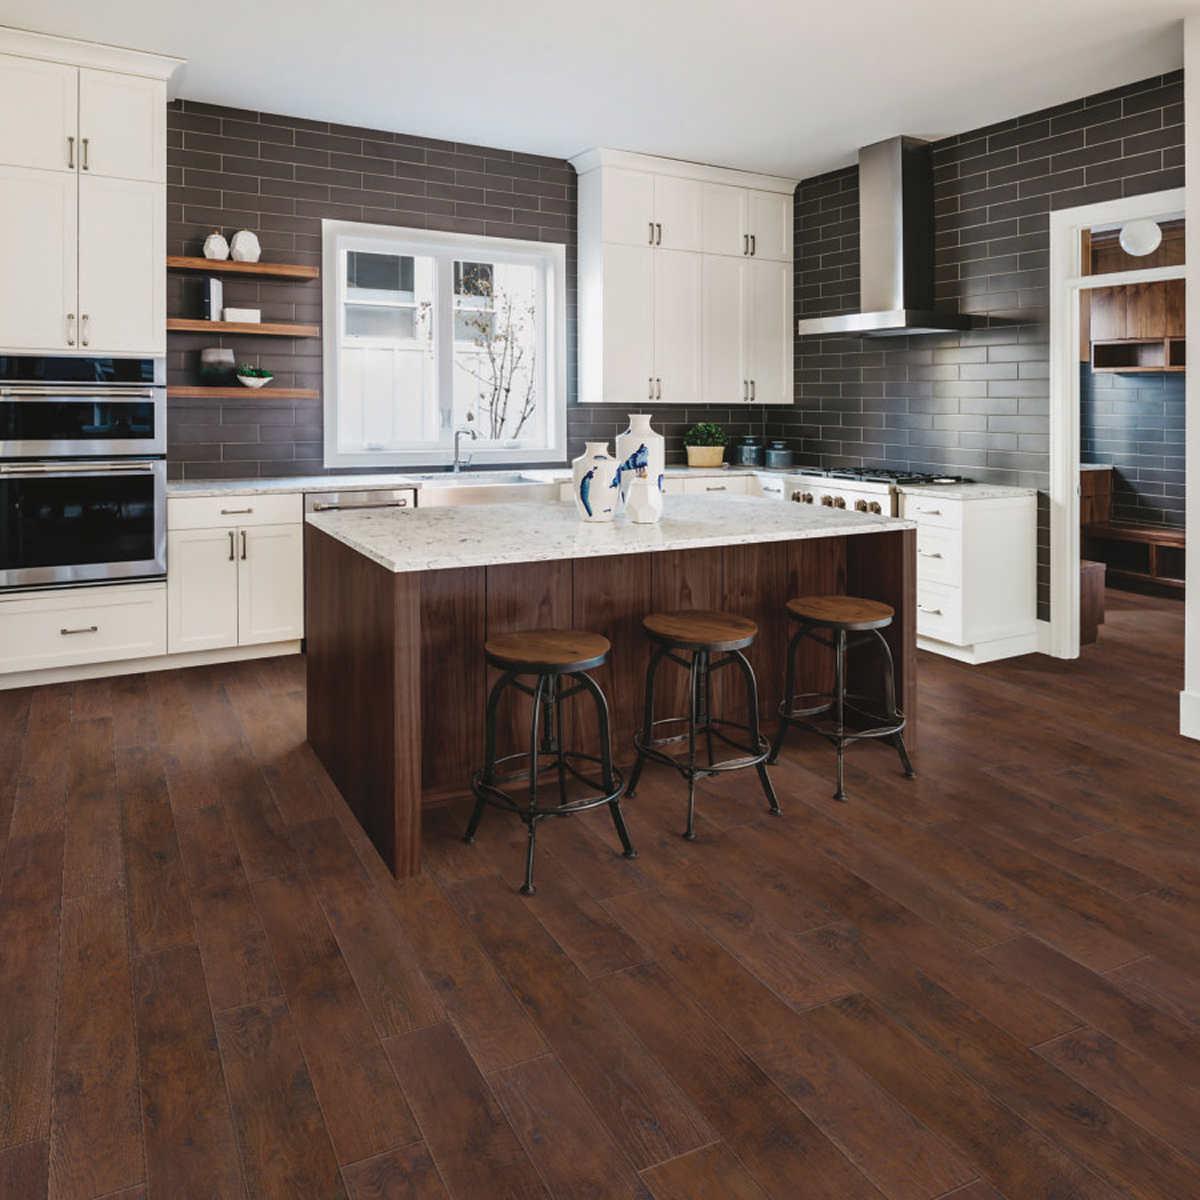 Mohawk Home Rustic Spiced Oak Laminate Flooring